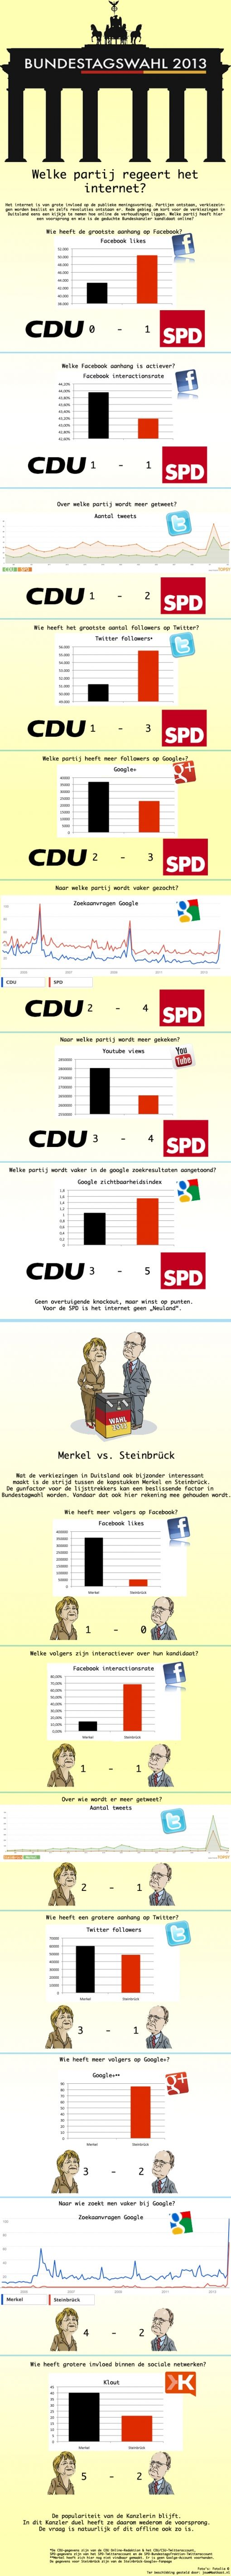 Bondsdag verkiezingen Duitsland CDU vs. SPD Merkel vs. Steinbrück